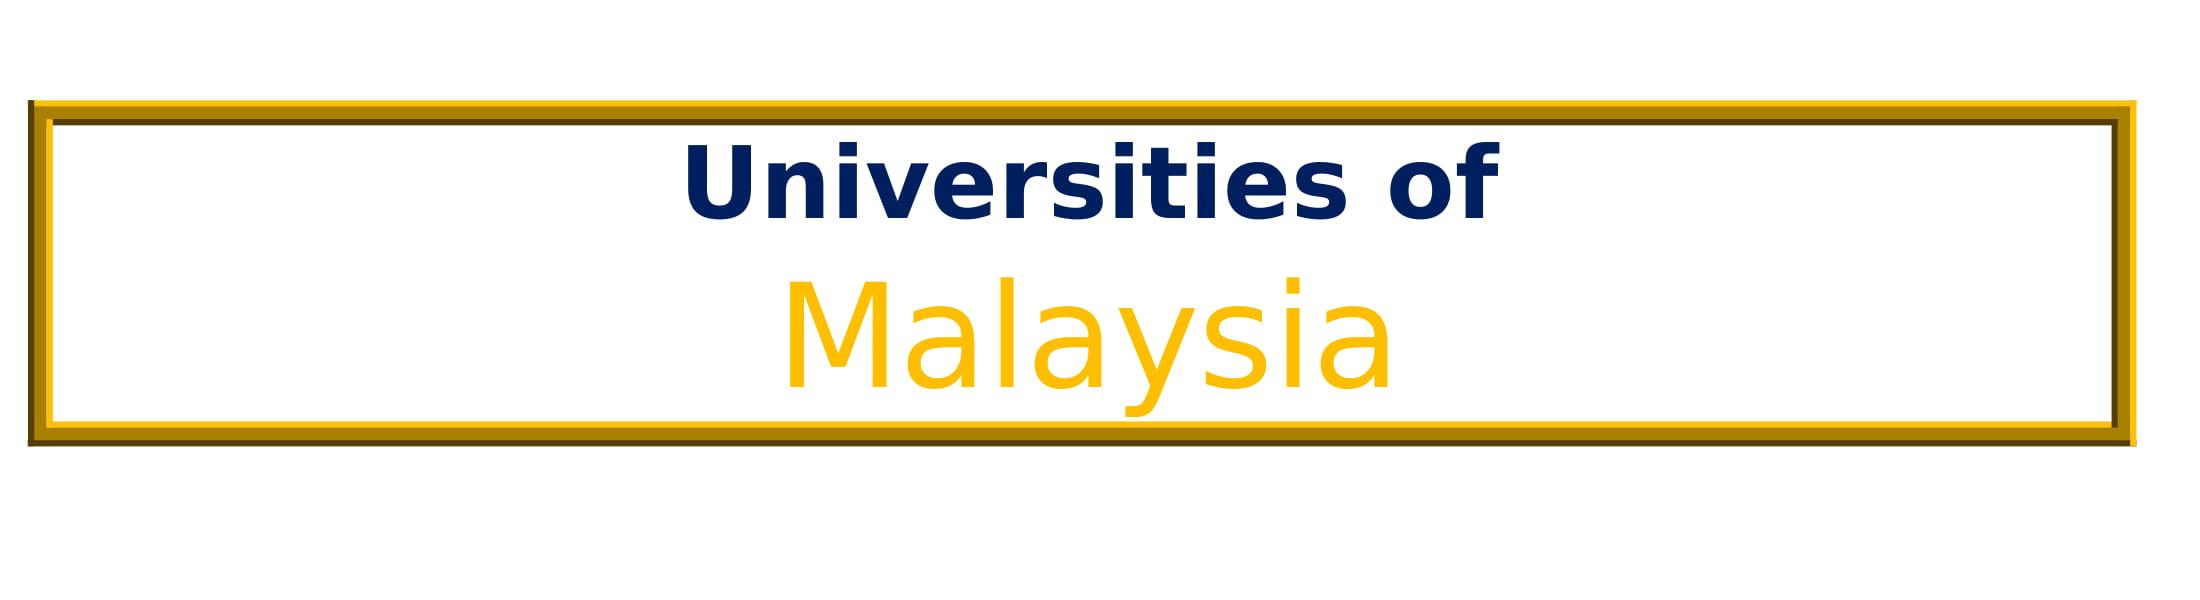 List of Universities in Malaysia